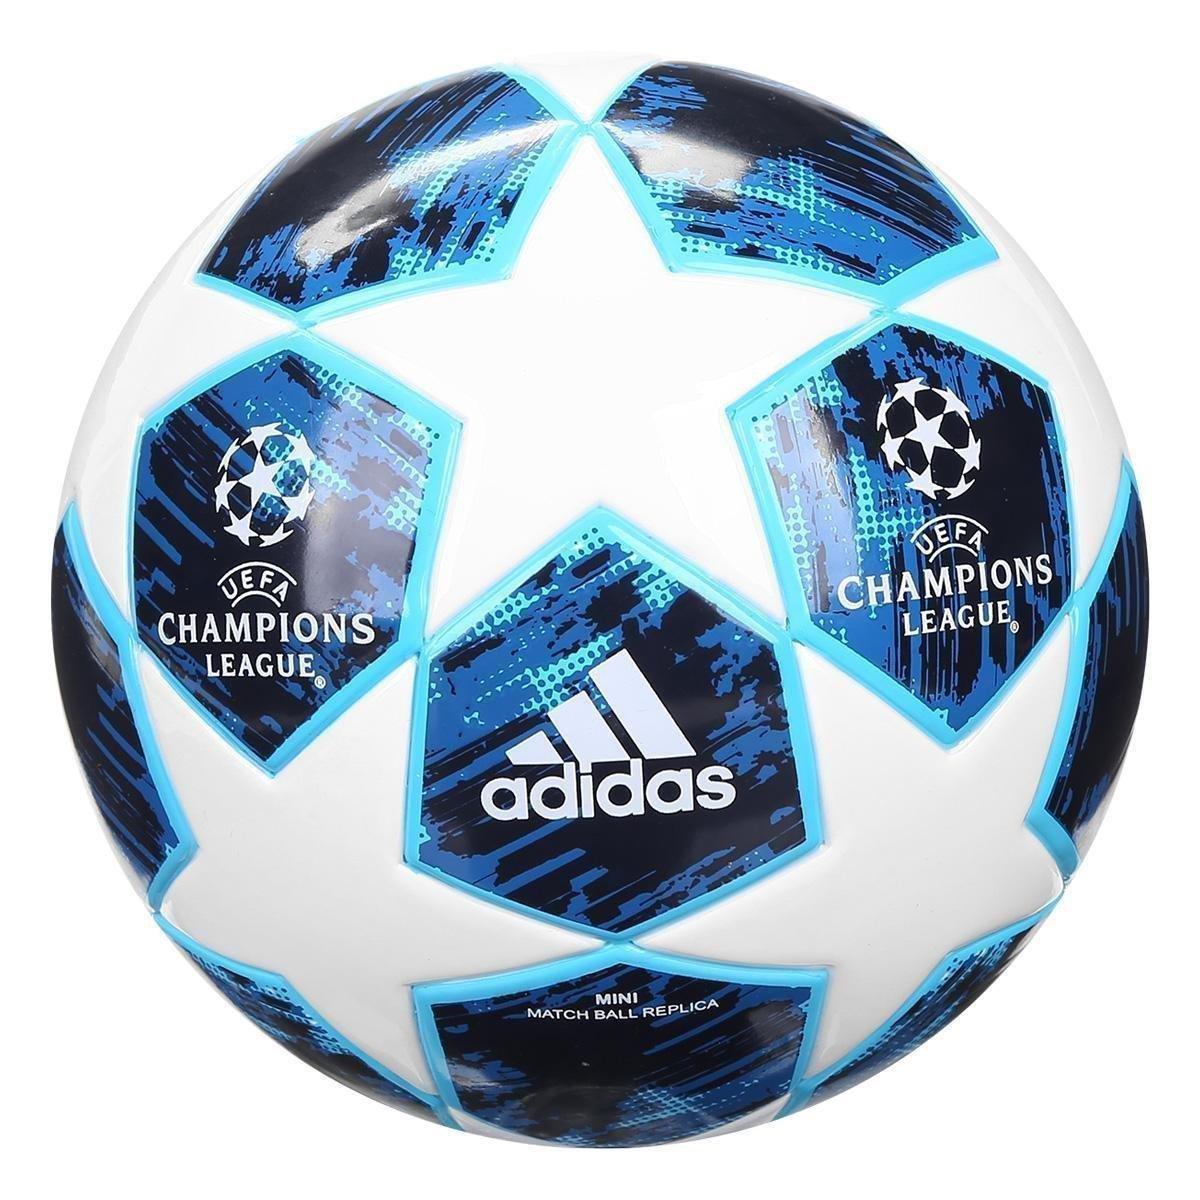 ... Mini Bola de Futebol Uefa Champions League Adidas Finale18 - Compre  Agora Netshoes special sales 30f1c ... c70745b8d0988